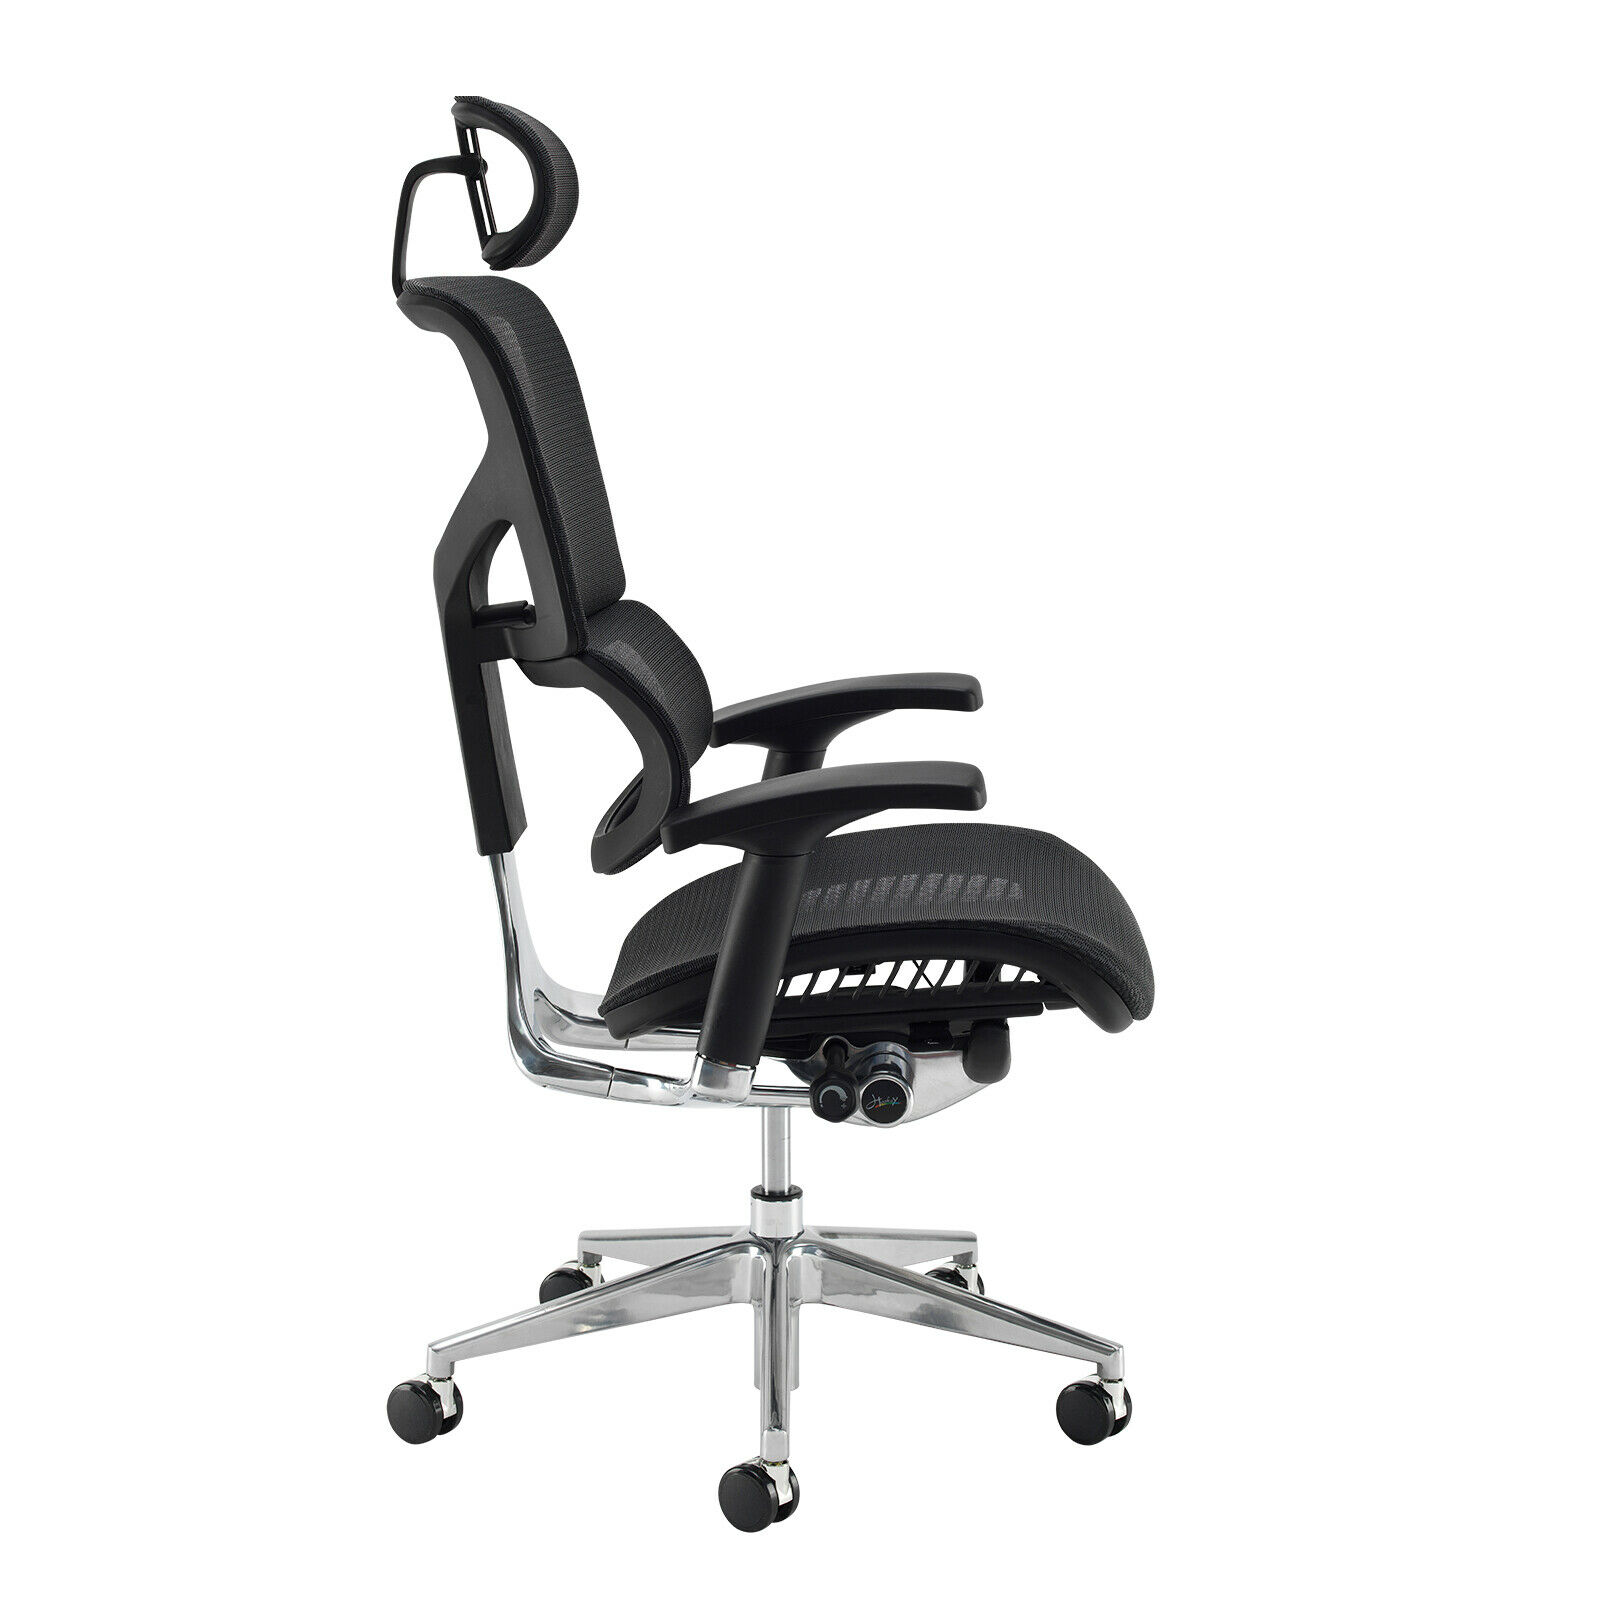 Sensational Details About Ergonomic Mesh Office Chair Dynamo Black Executive Chair Incl Headrest Home Interior And Landscaping Ologienasavecom